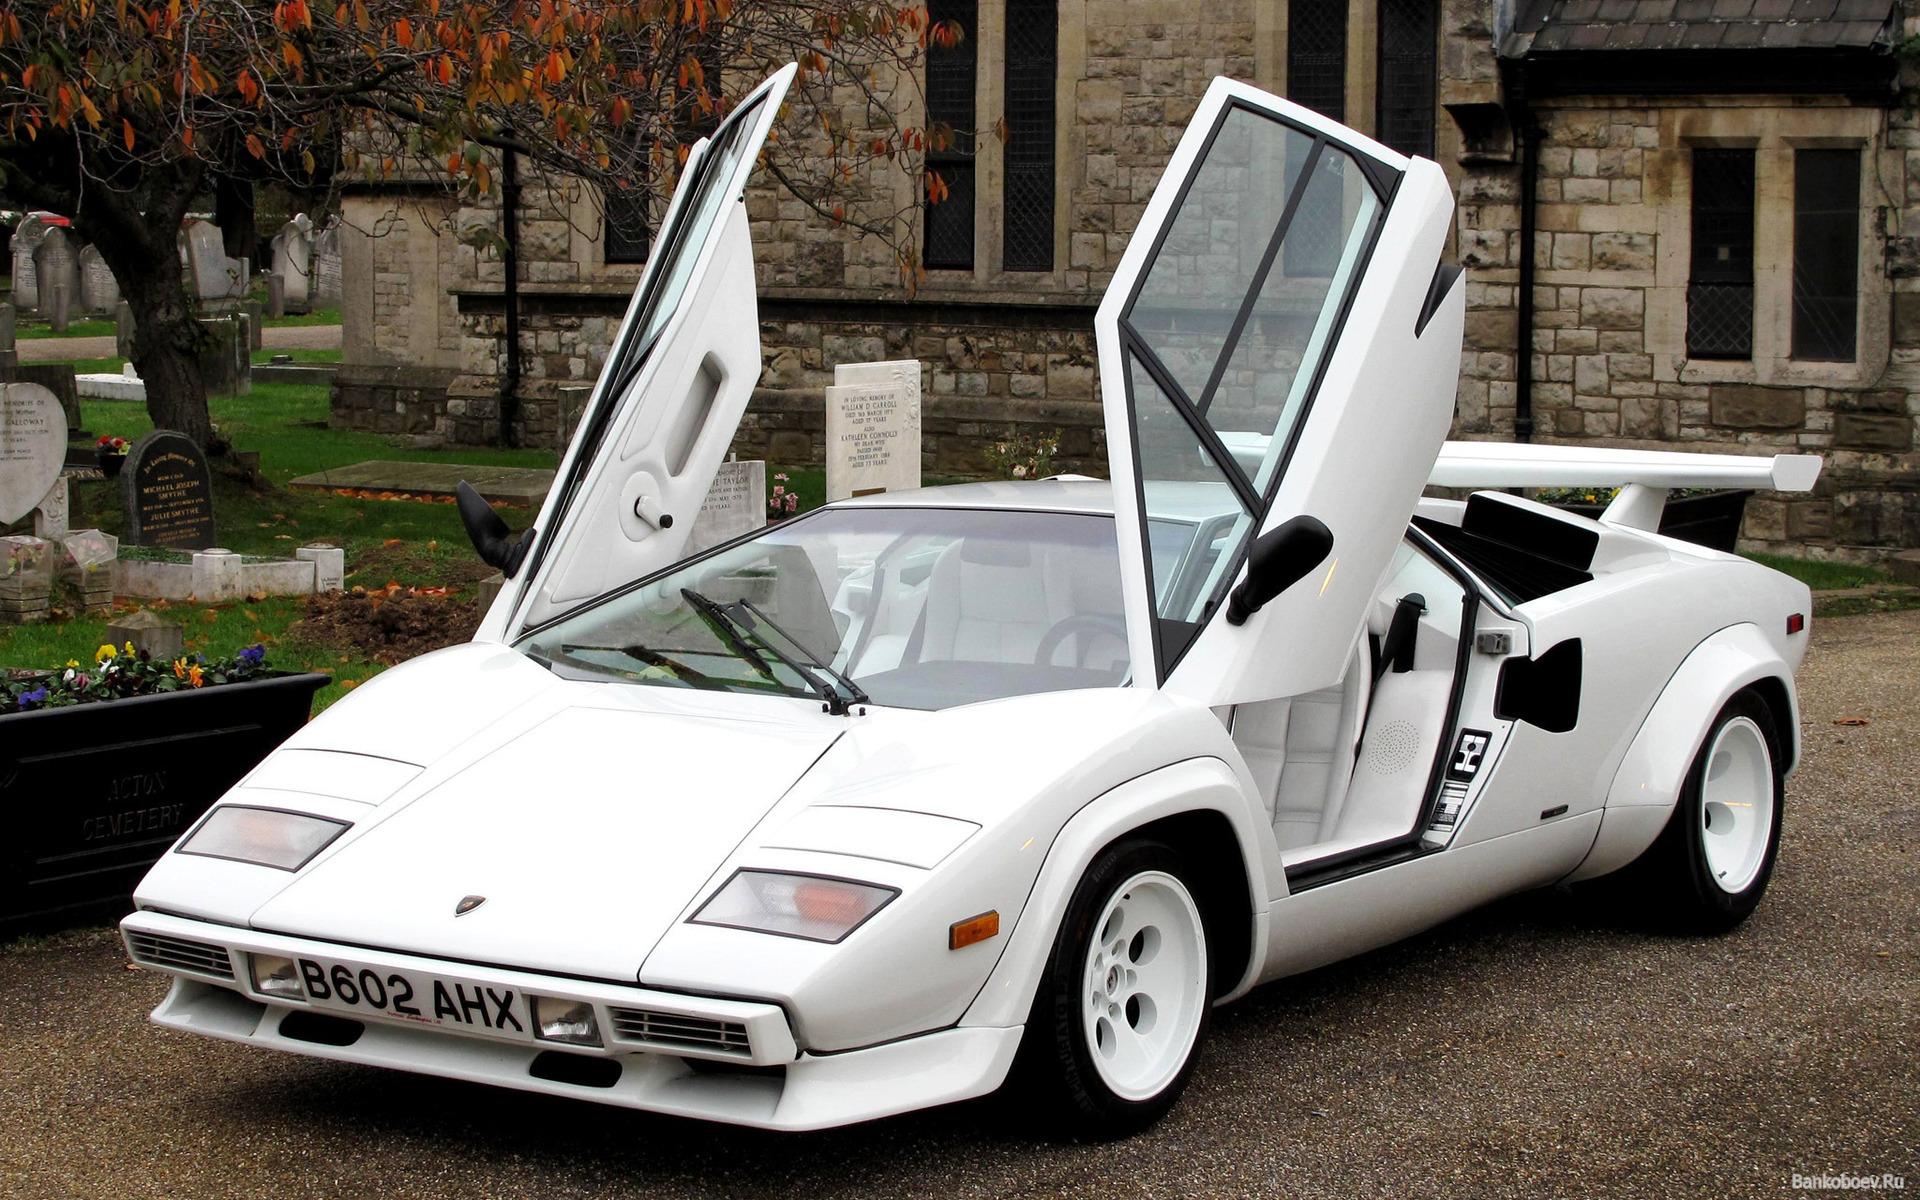 The Lamborghini Countach The Road